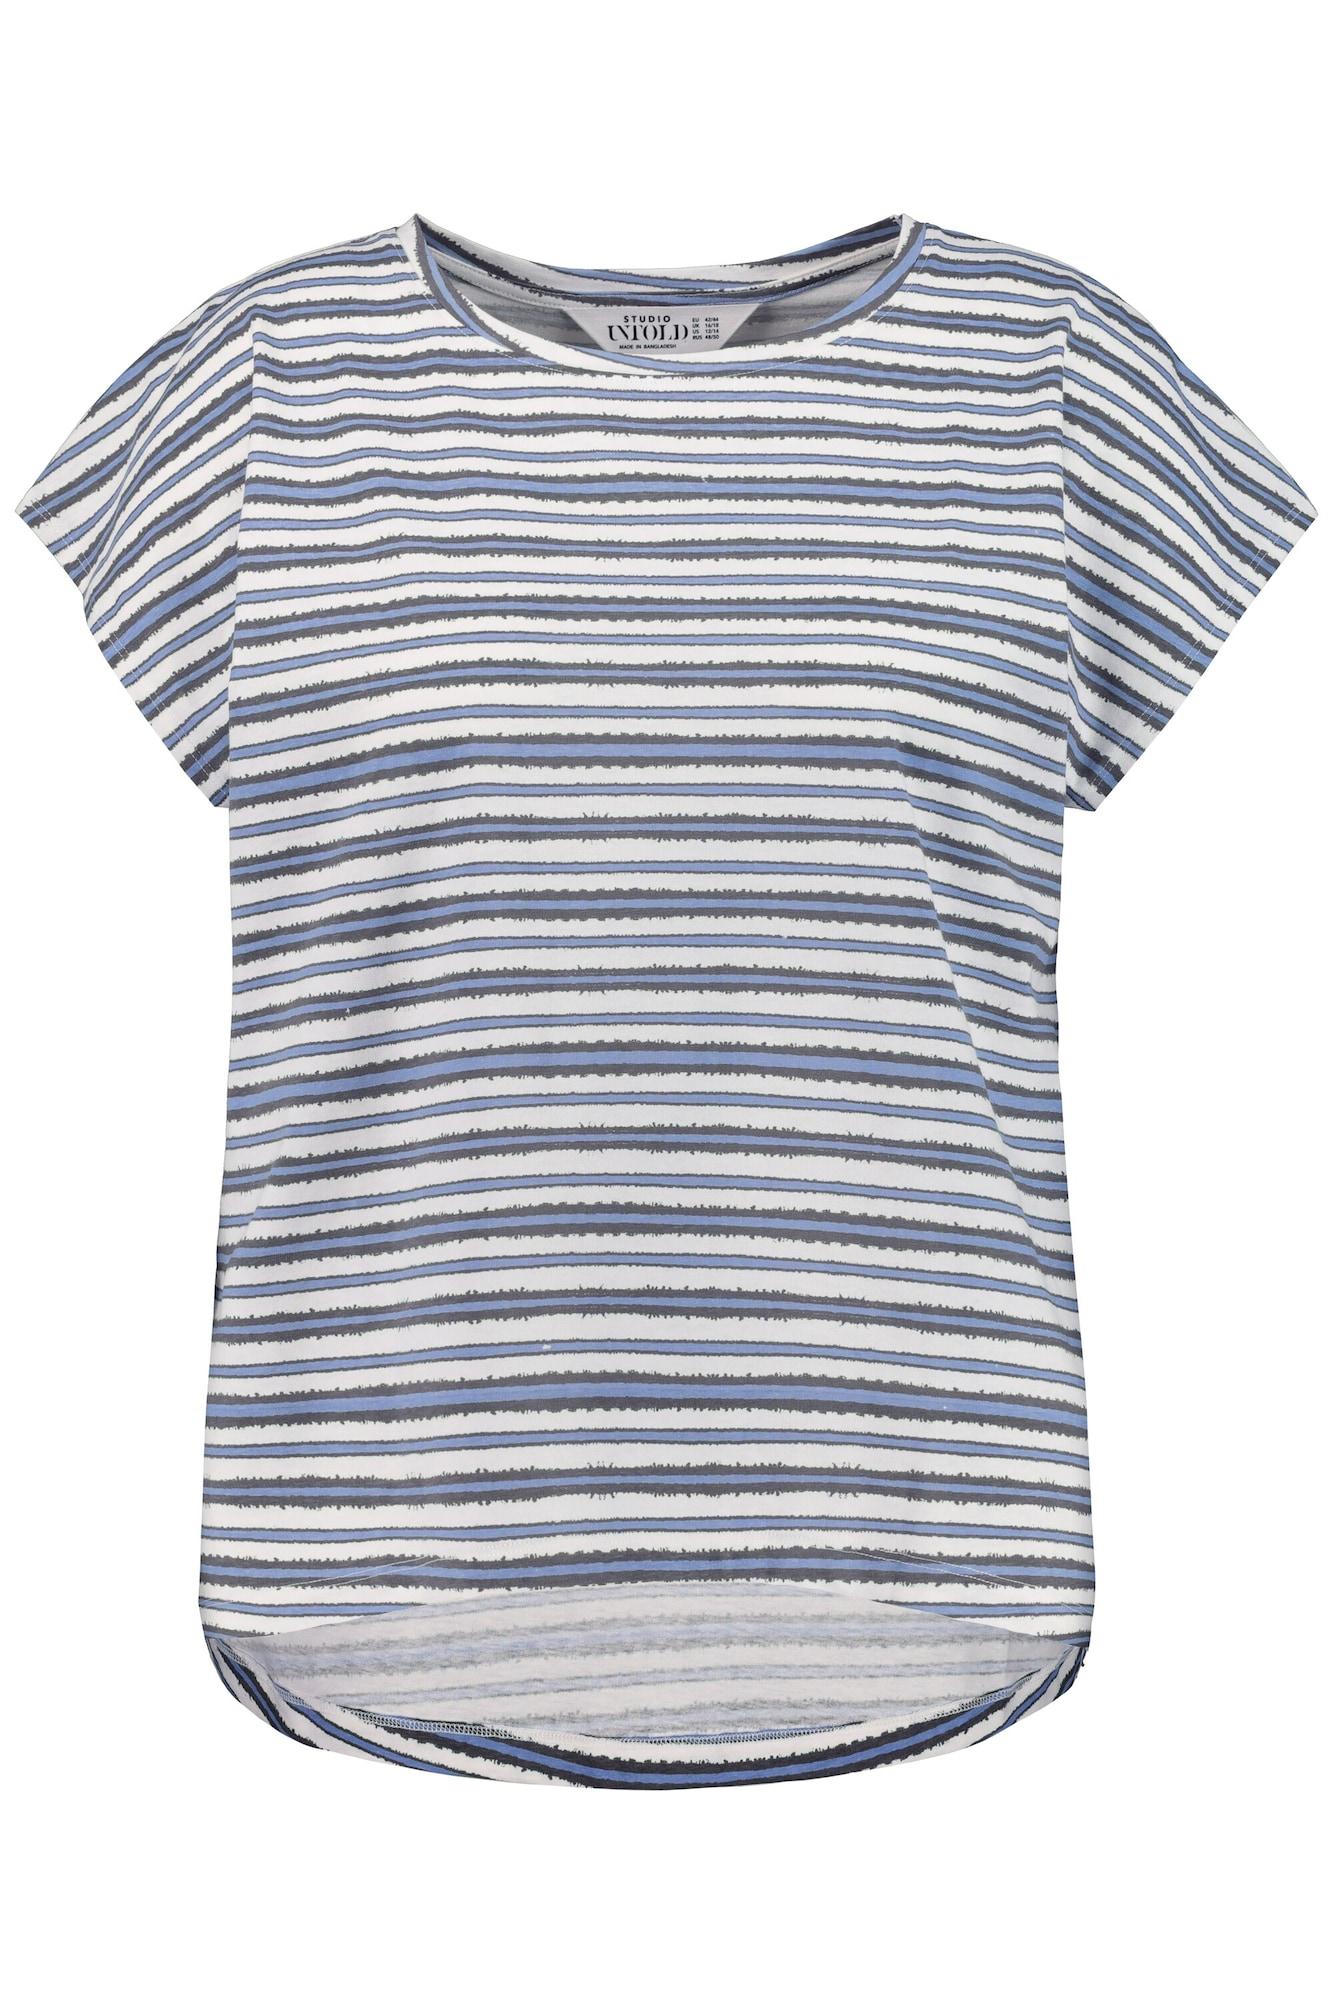 Studio Untold Marškinėliai melsvai pilka / azuro spalva / mėlyna dūmų spalva